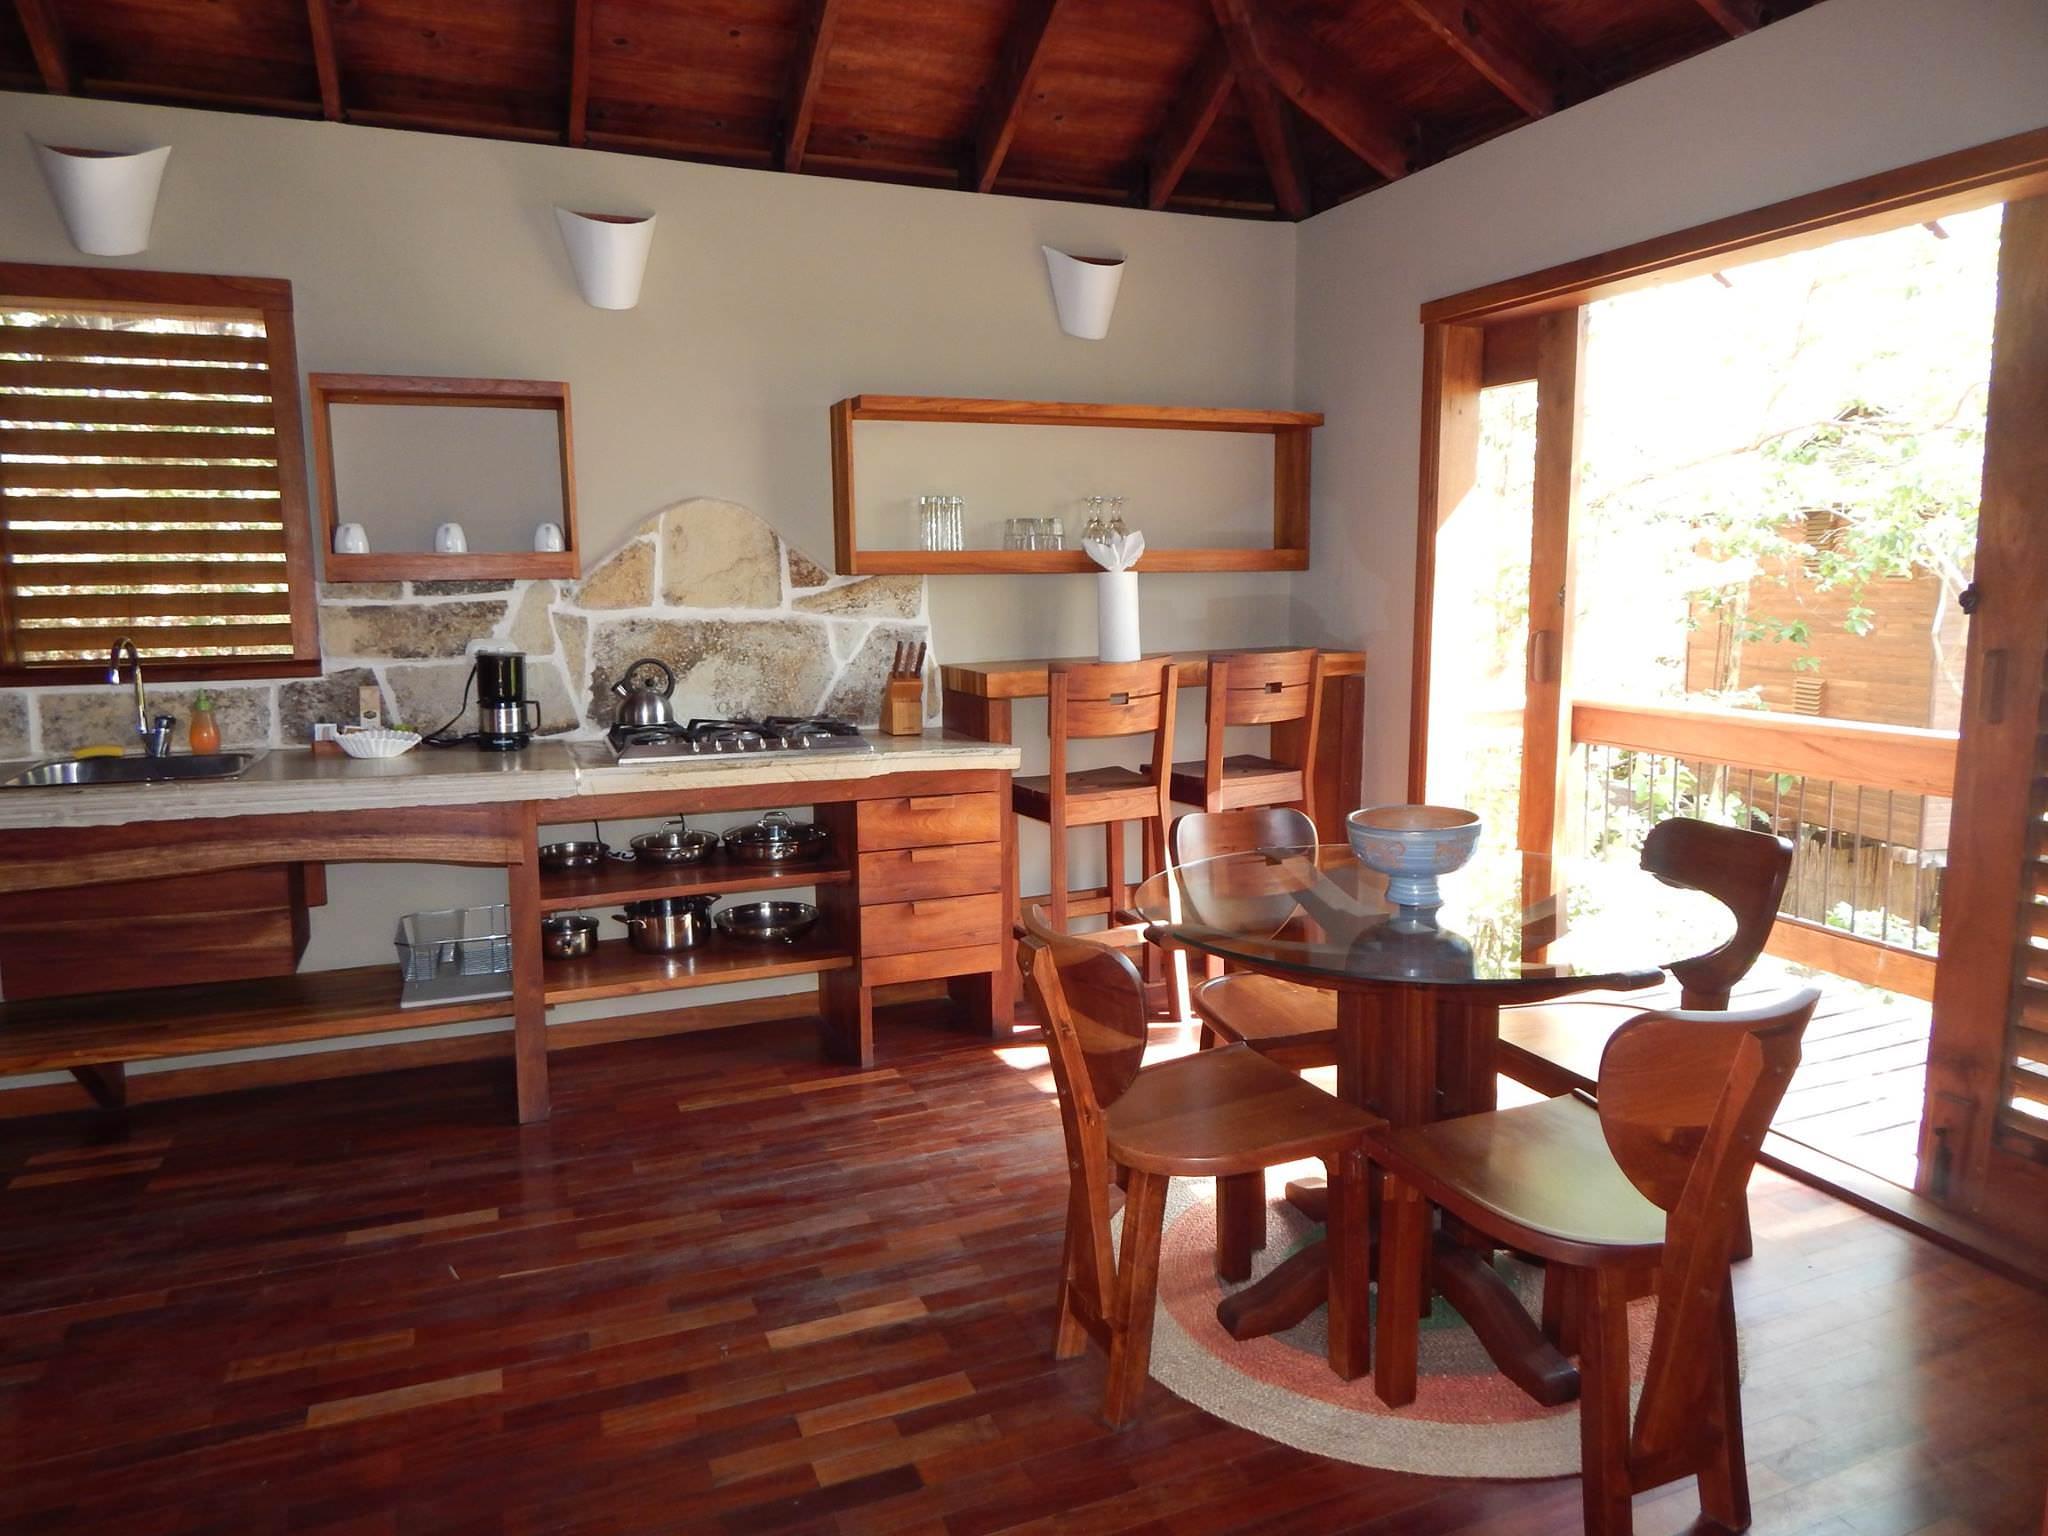 Kitchen in Aqua Wellness Resort Nicaragua